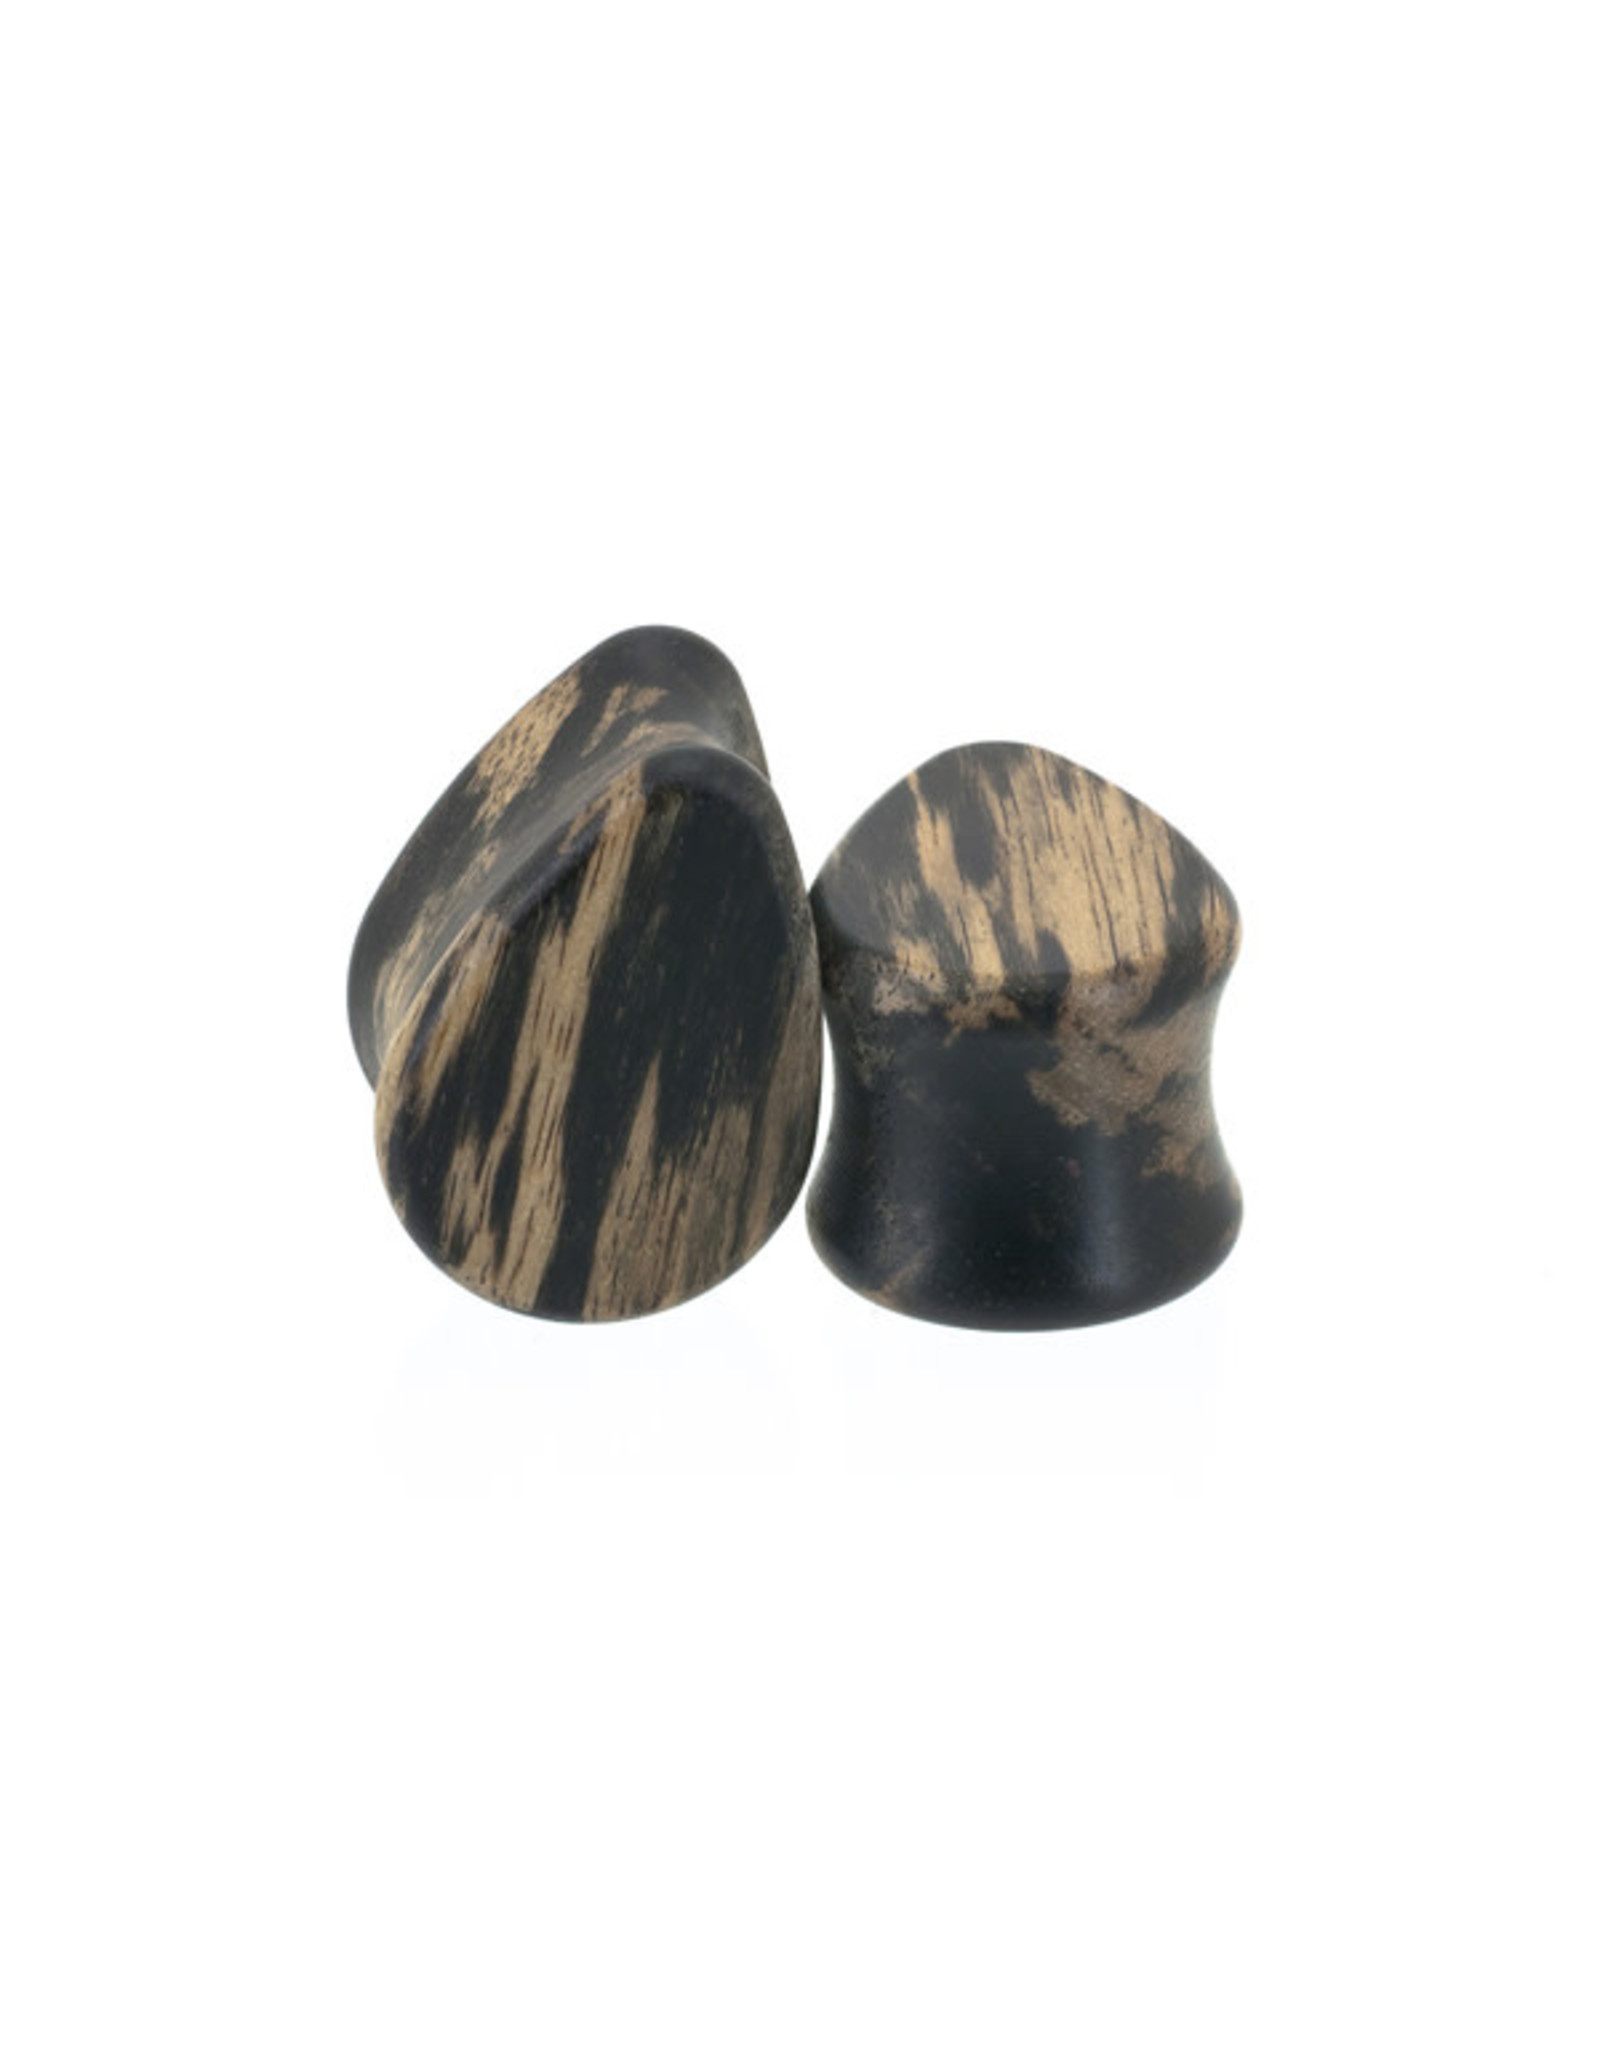 00g Tiger Ebony Wood Teardrops